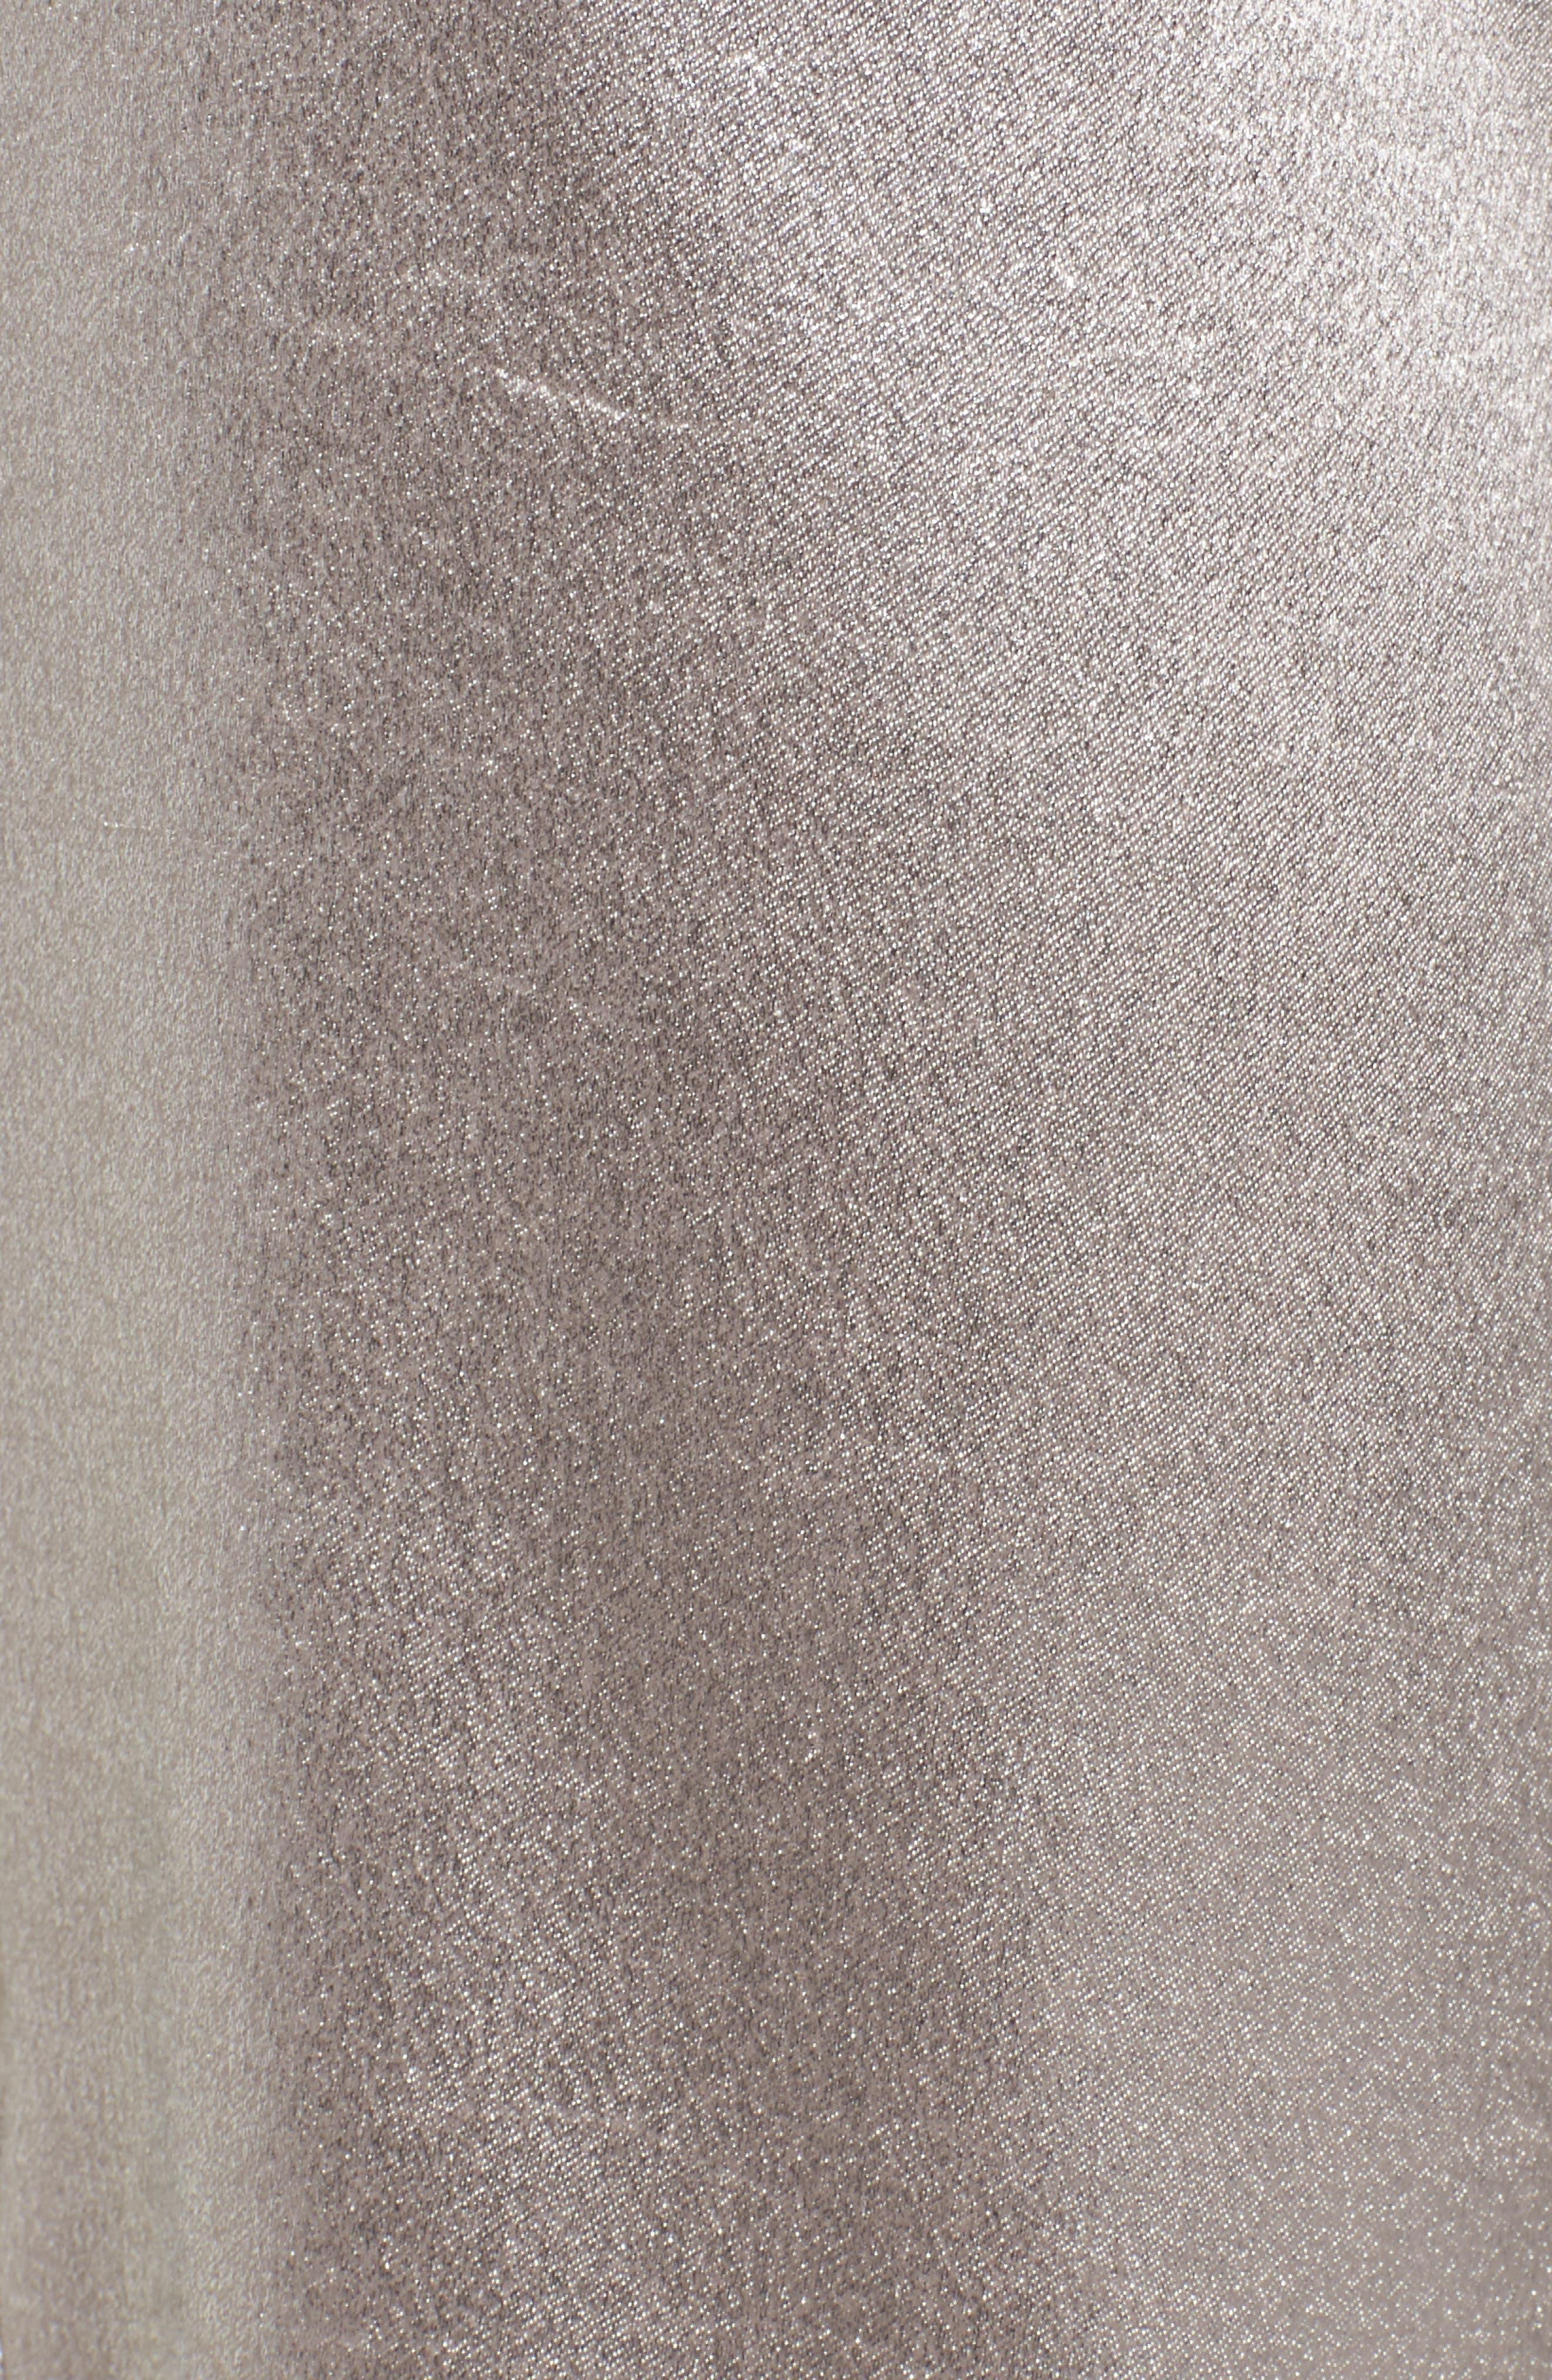 Ruffle Bustier Top,                             Alternate thumbnail 5, color,                             Grey Chateau Metallic